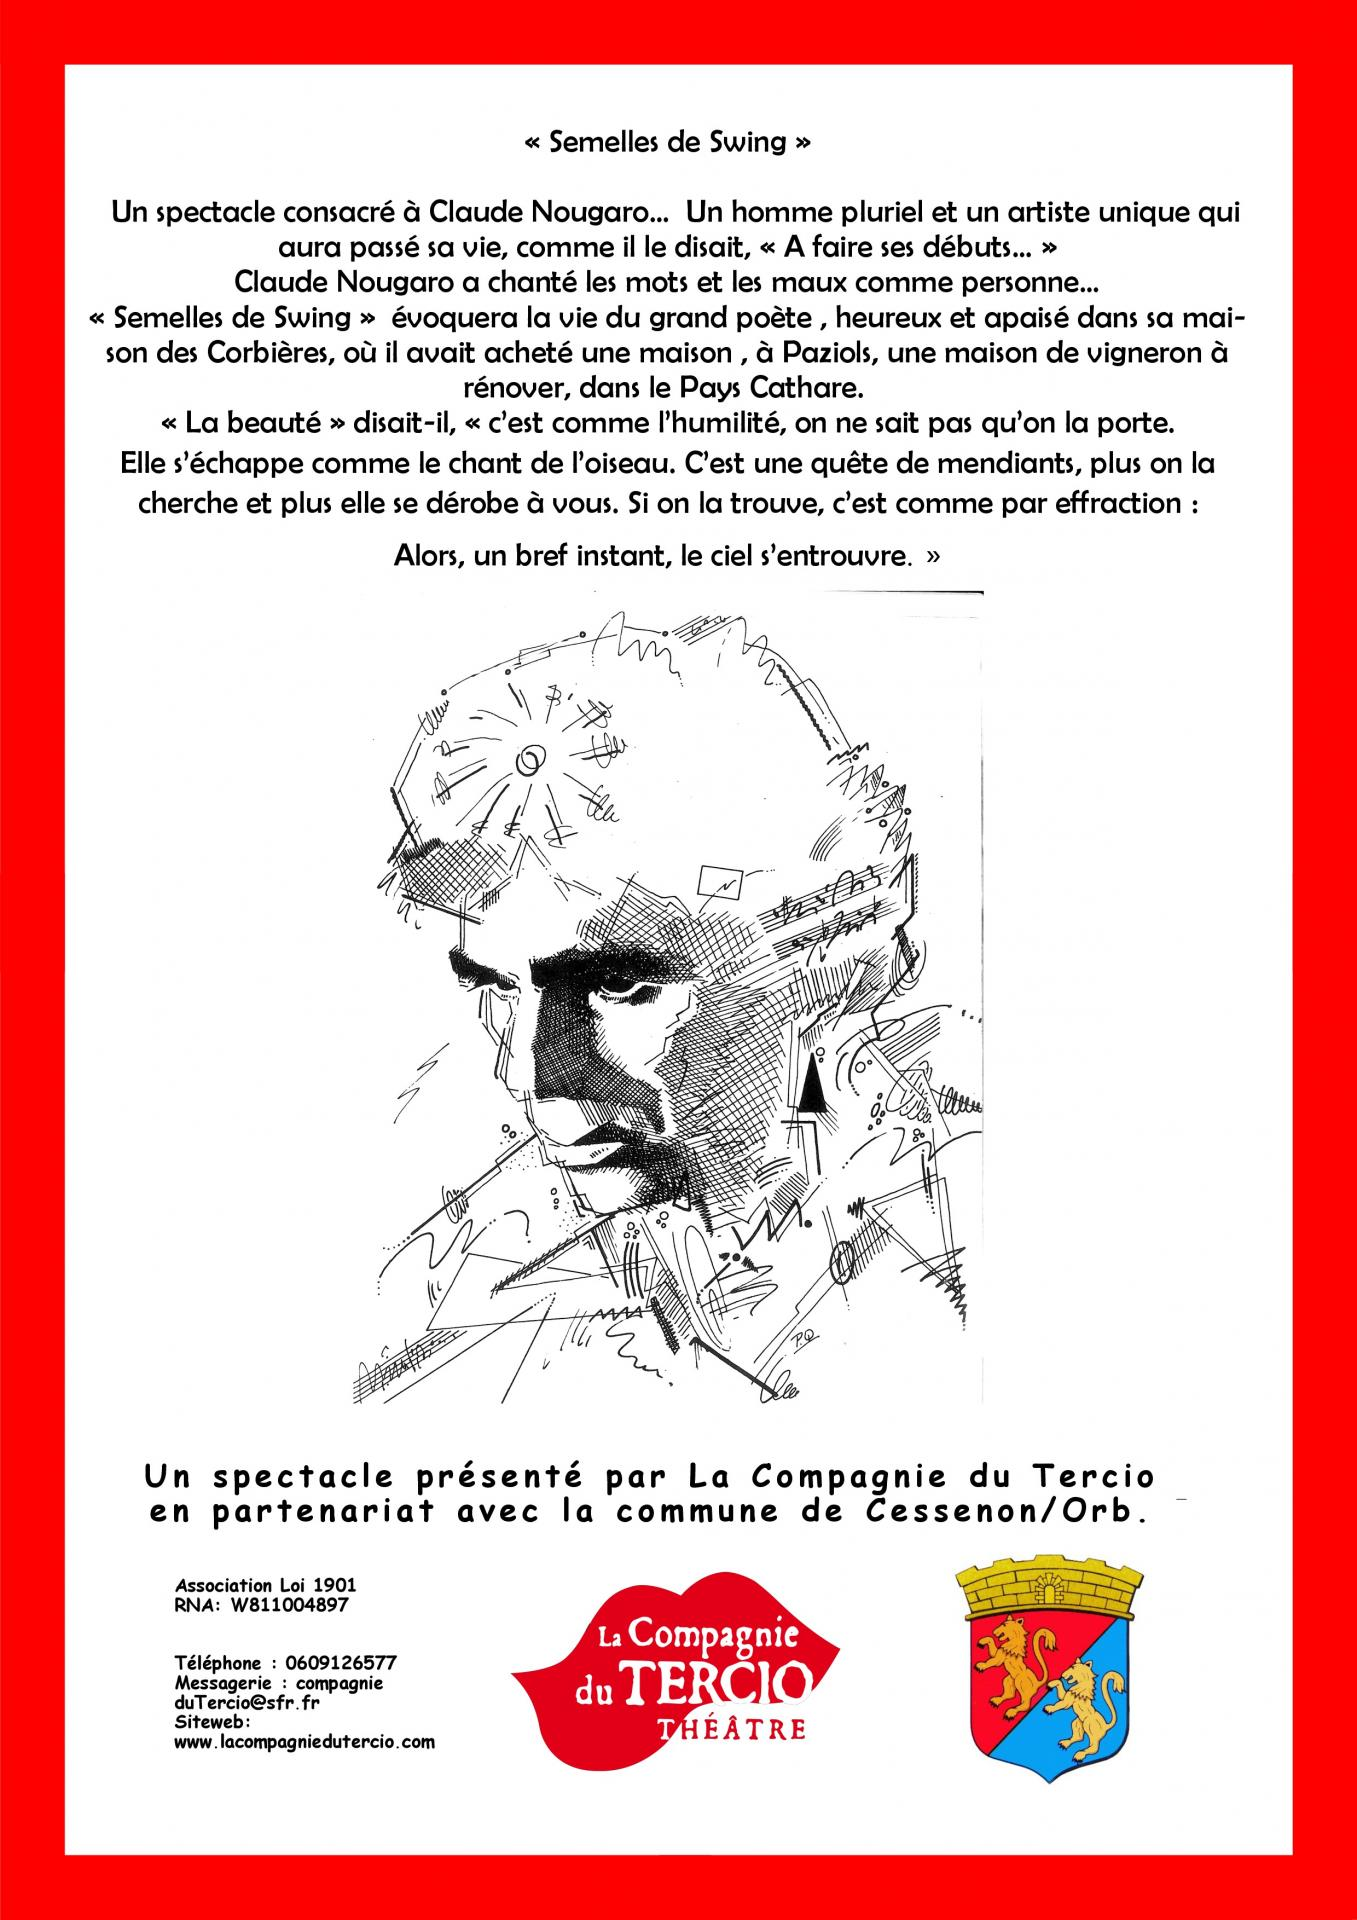 Verso affiche semelles swing pitch logo mairie cessenon